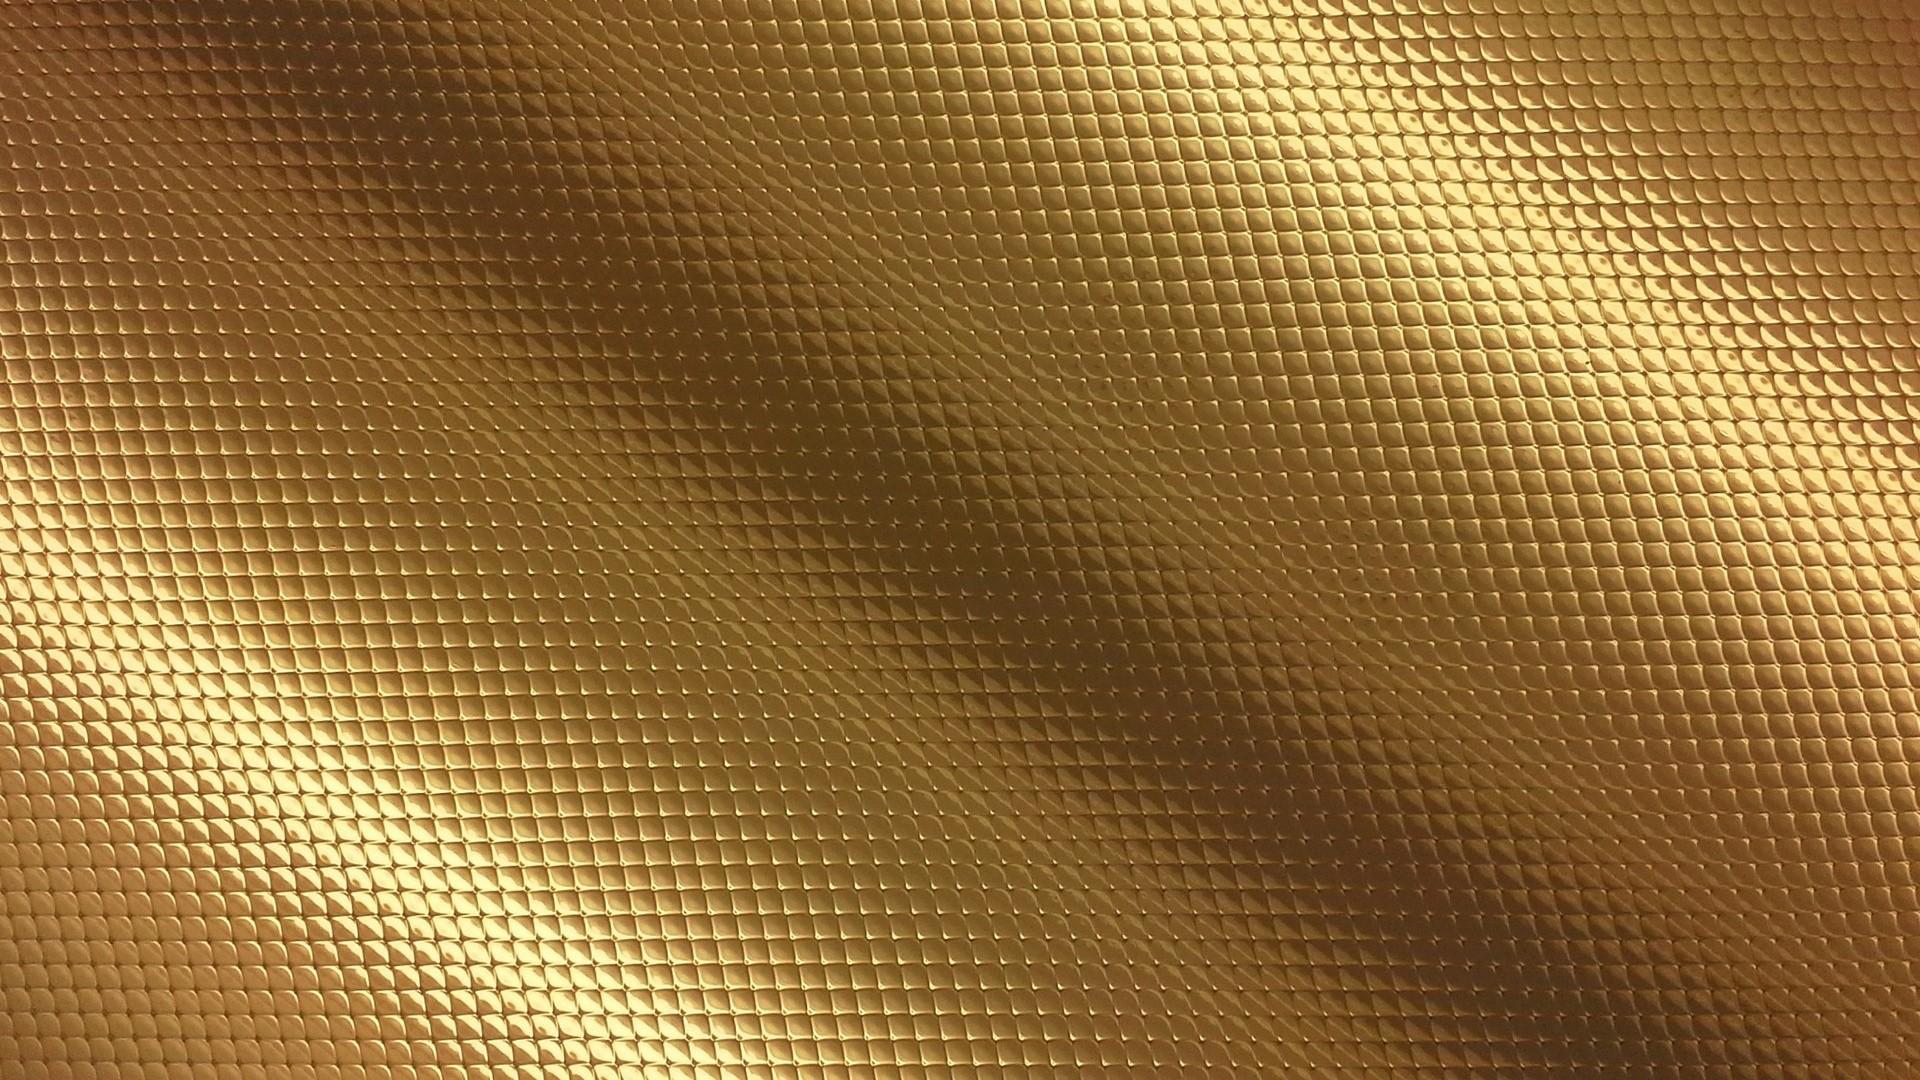 White And Gold hd desktop wallpaper